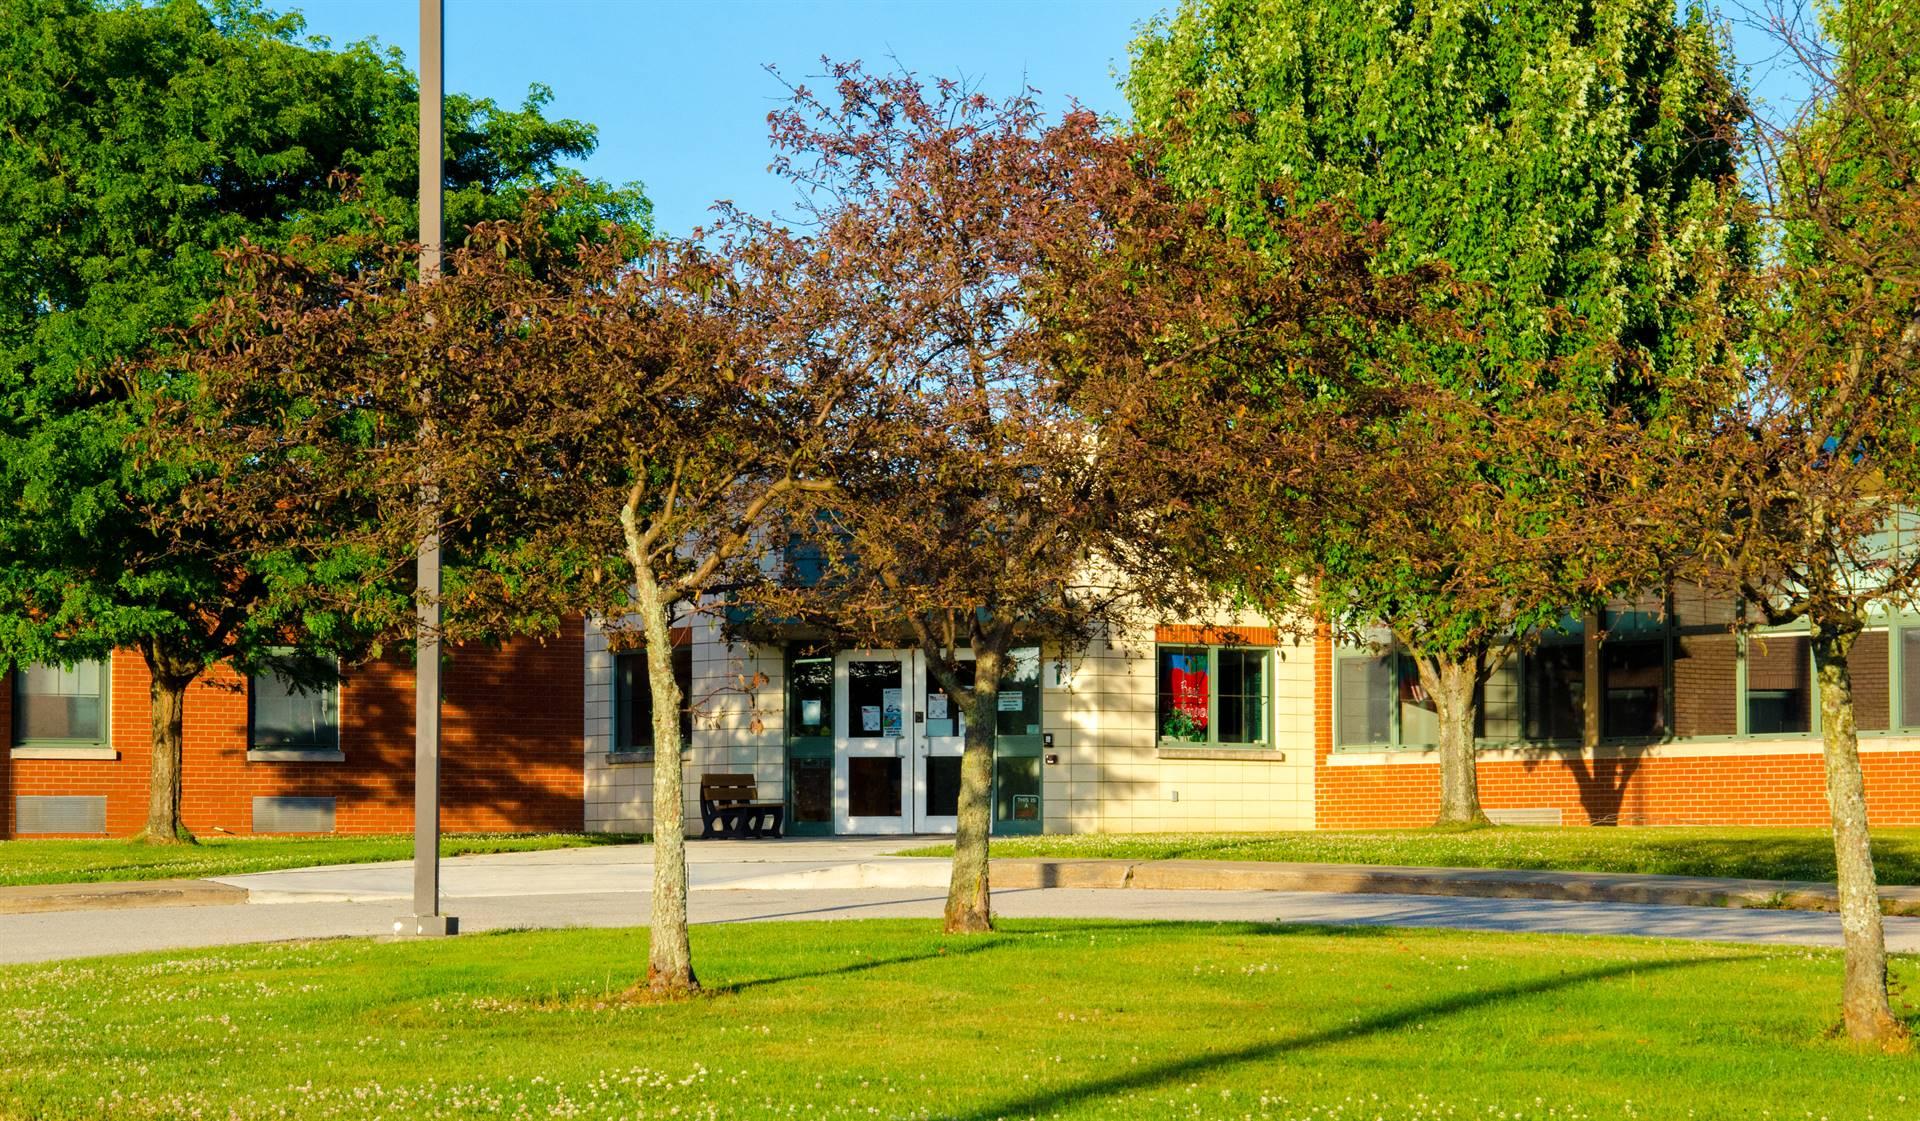 Curtisville Primary Center